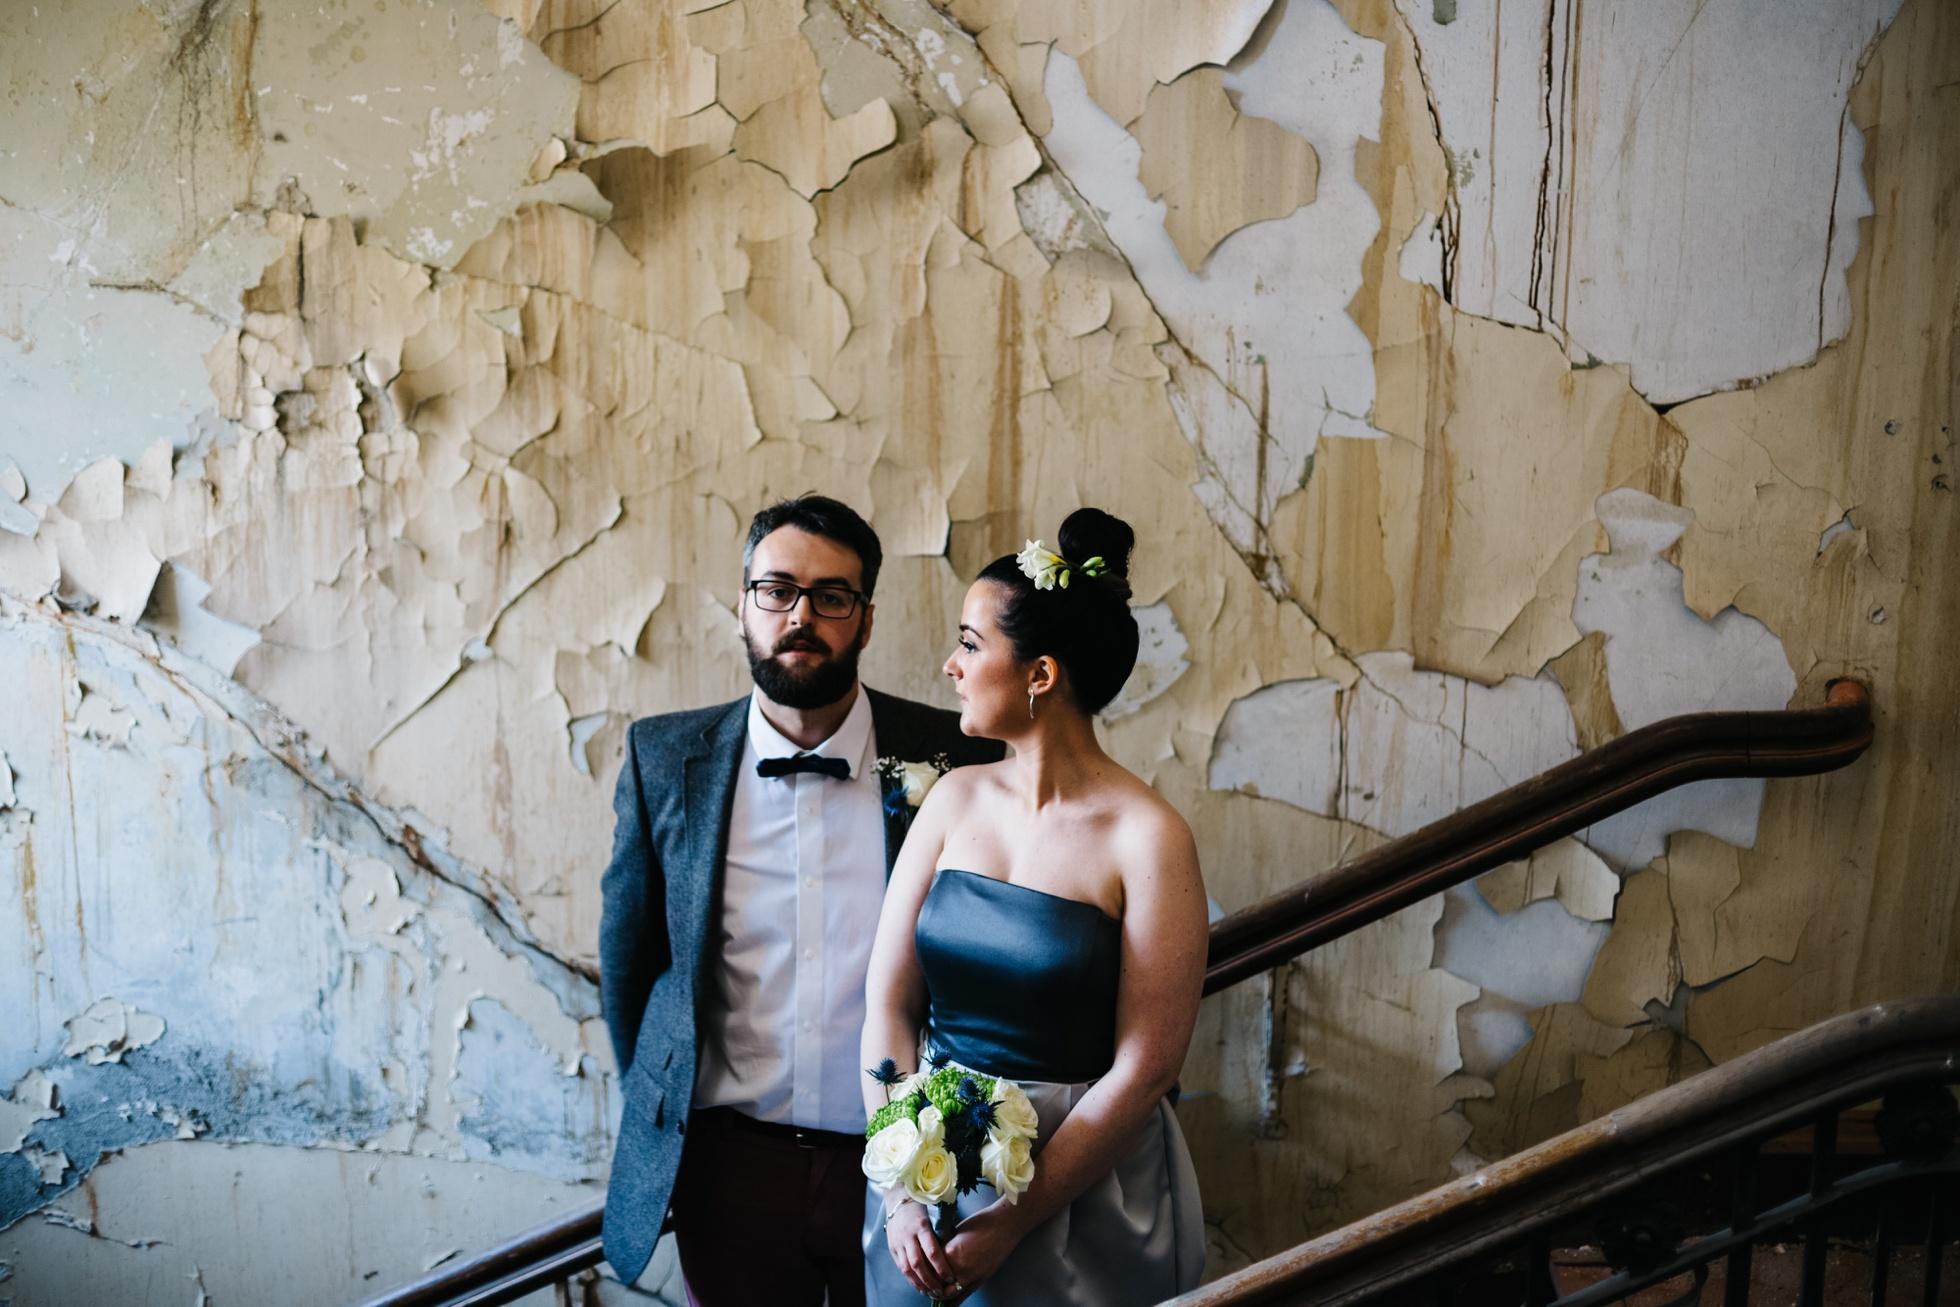 wedding photographer northern ireland, city wedding